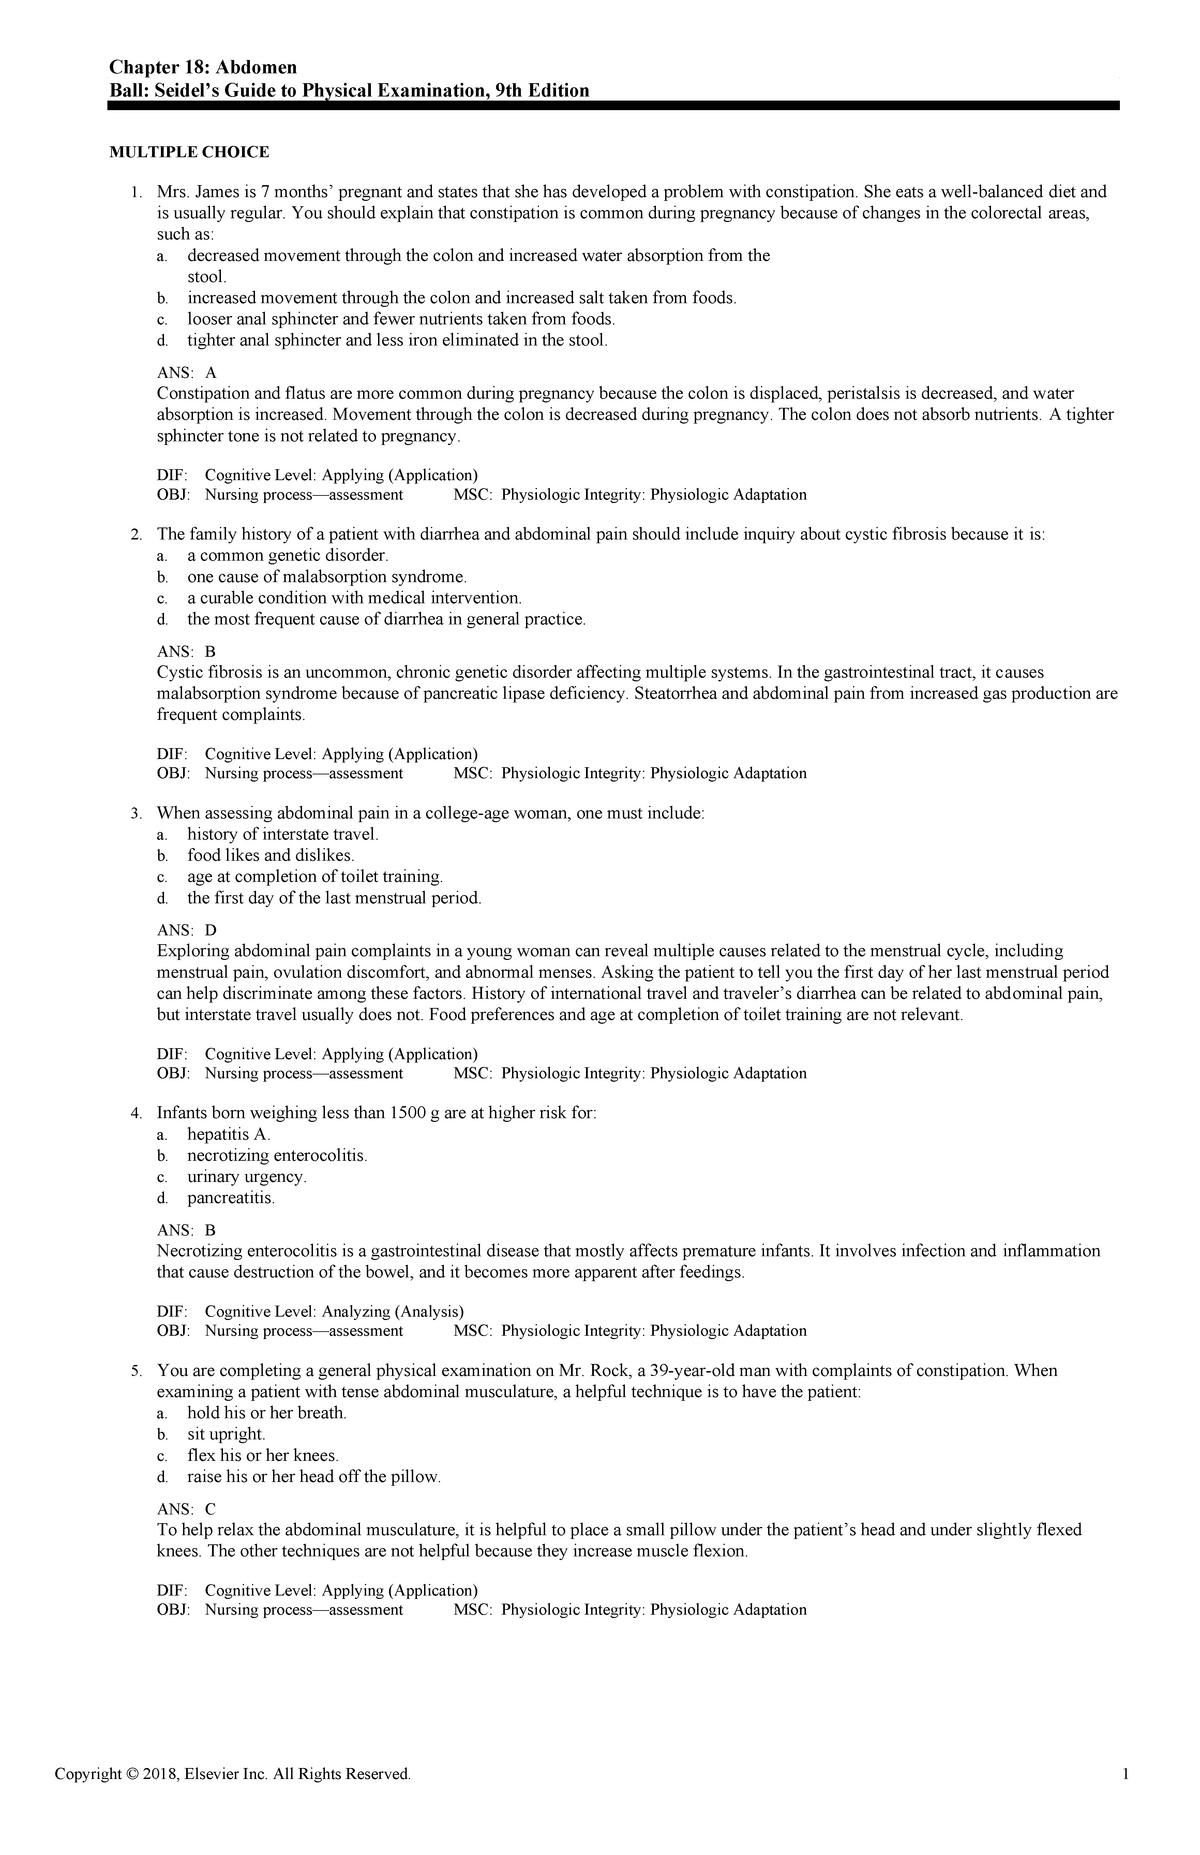 Exam View - Chapter 18 - 043 - UC San Francisco - StuDocu